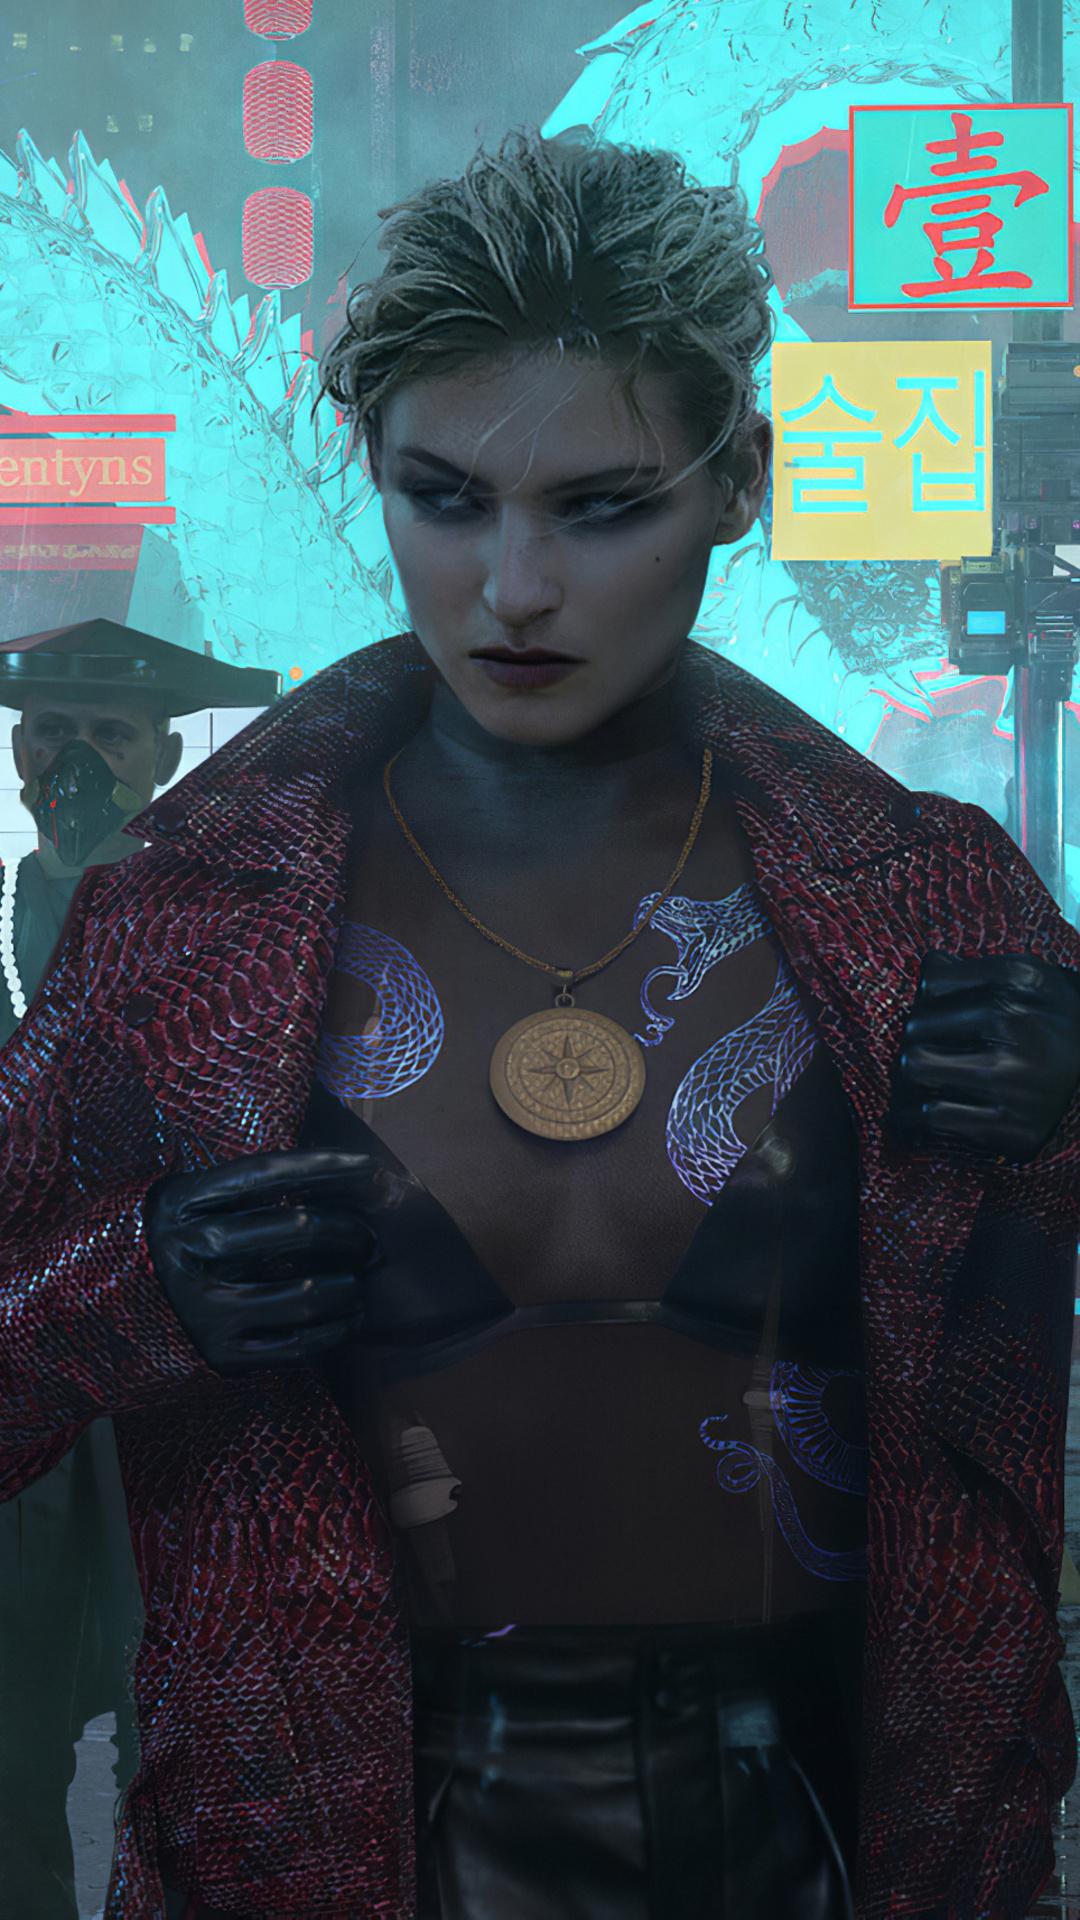 cyberpunk-city-girl-et.jpg